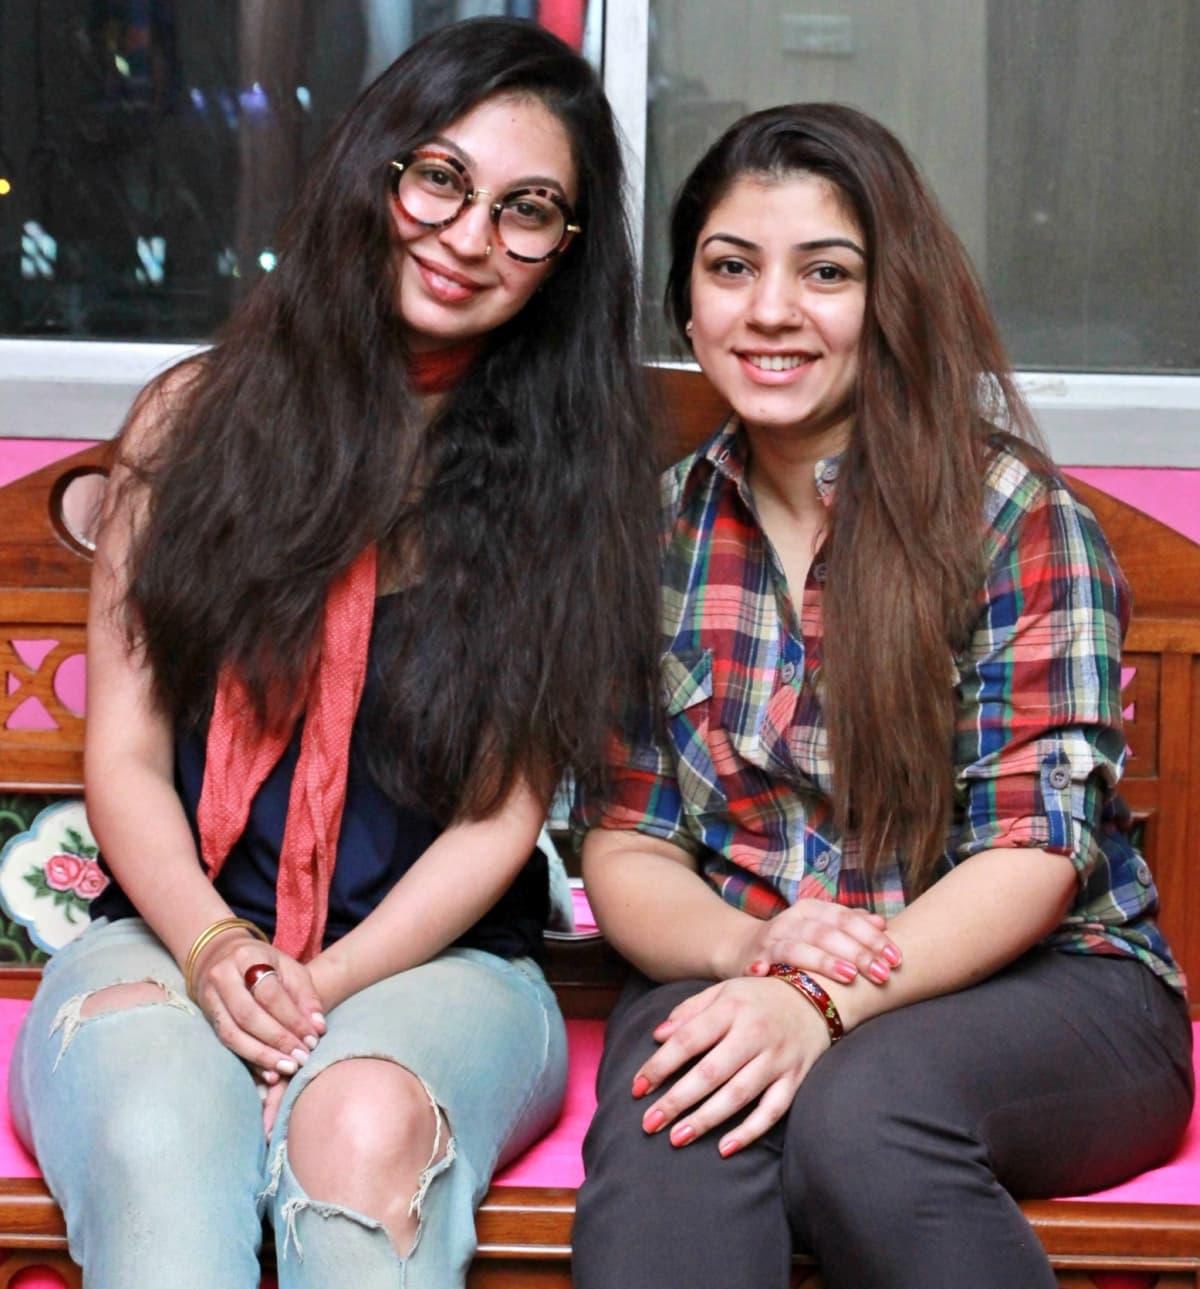 Watch Rubya Chaudhry video